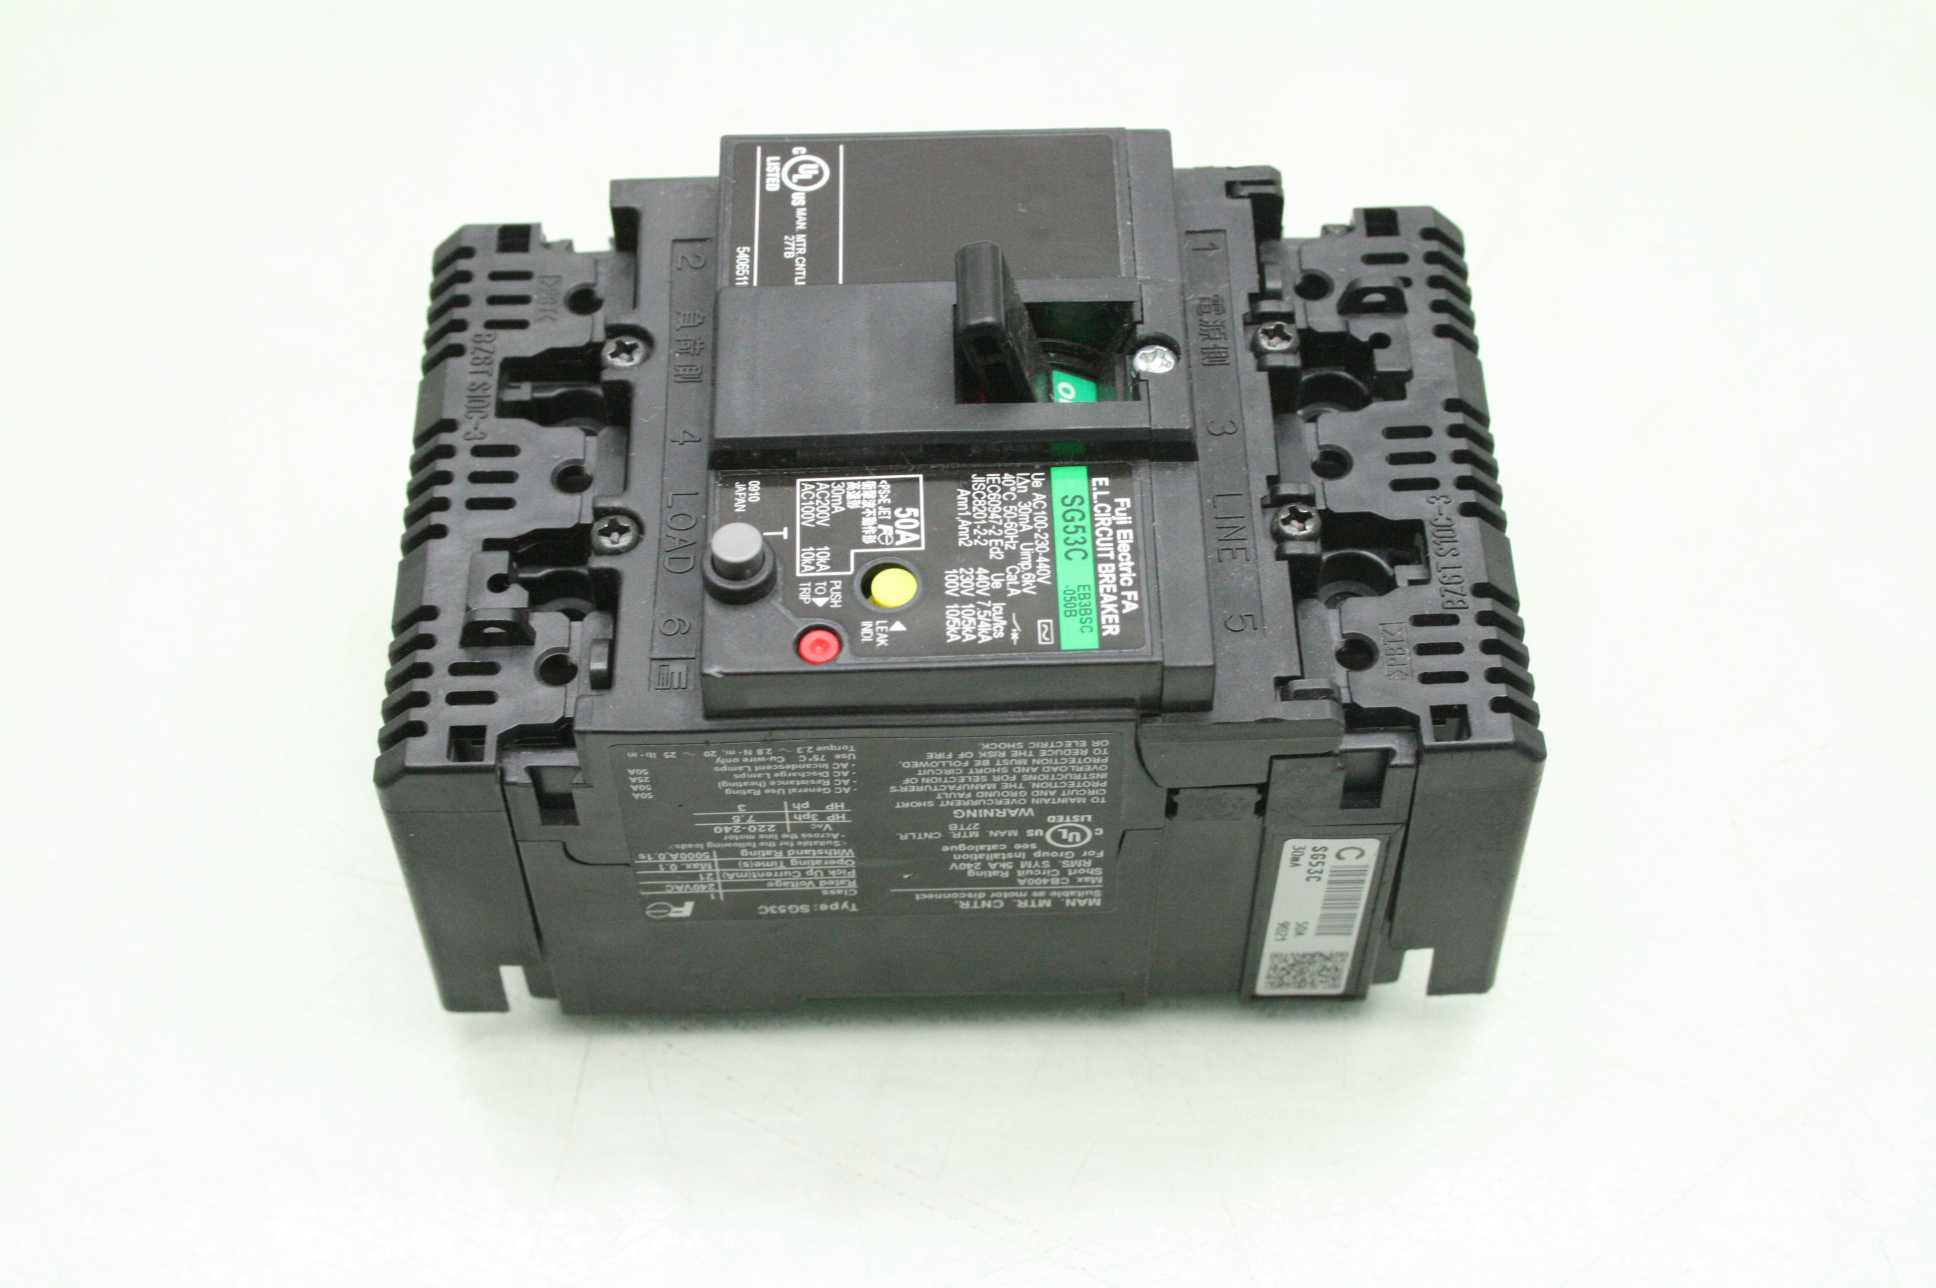 Fuji Electric SG53C-EB3BSC-050B Circuit Breaker 50A to 440V AC 3 Pole - Used